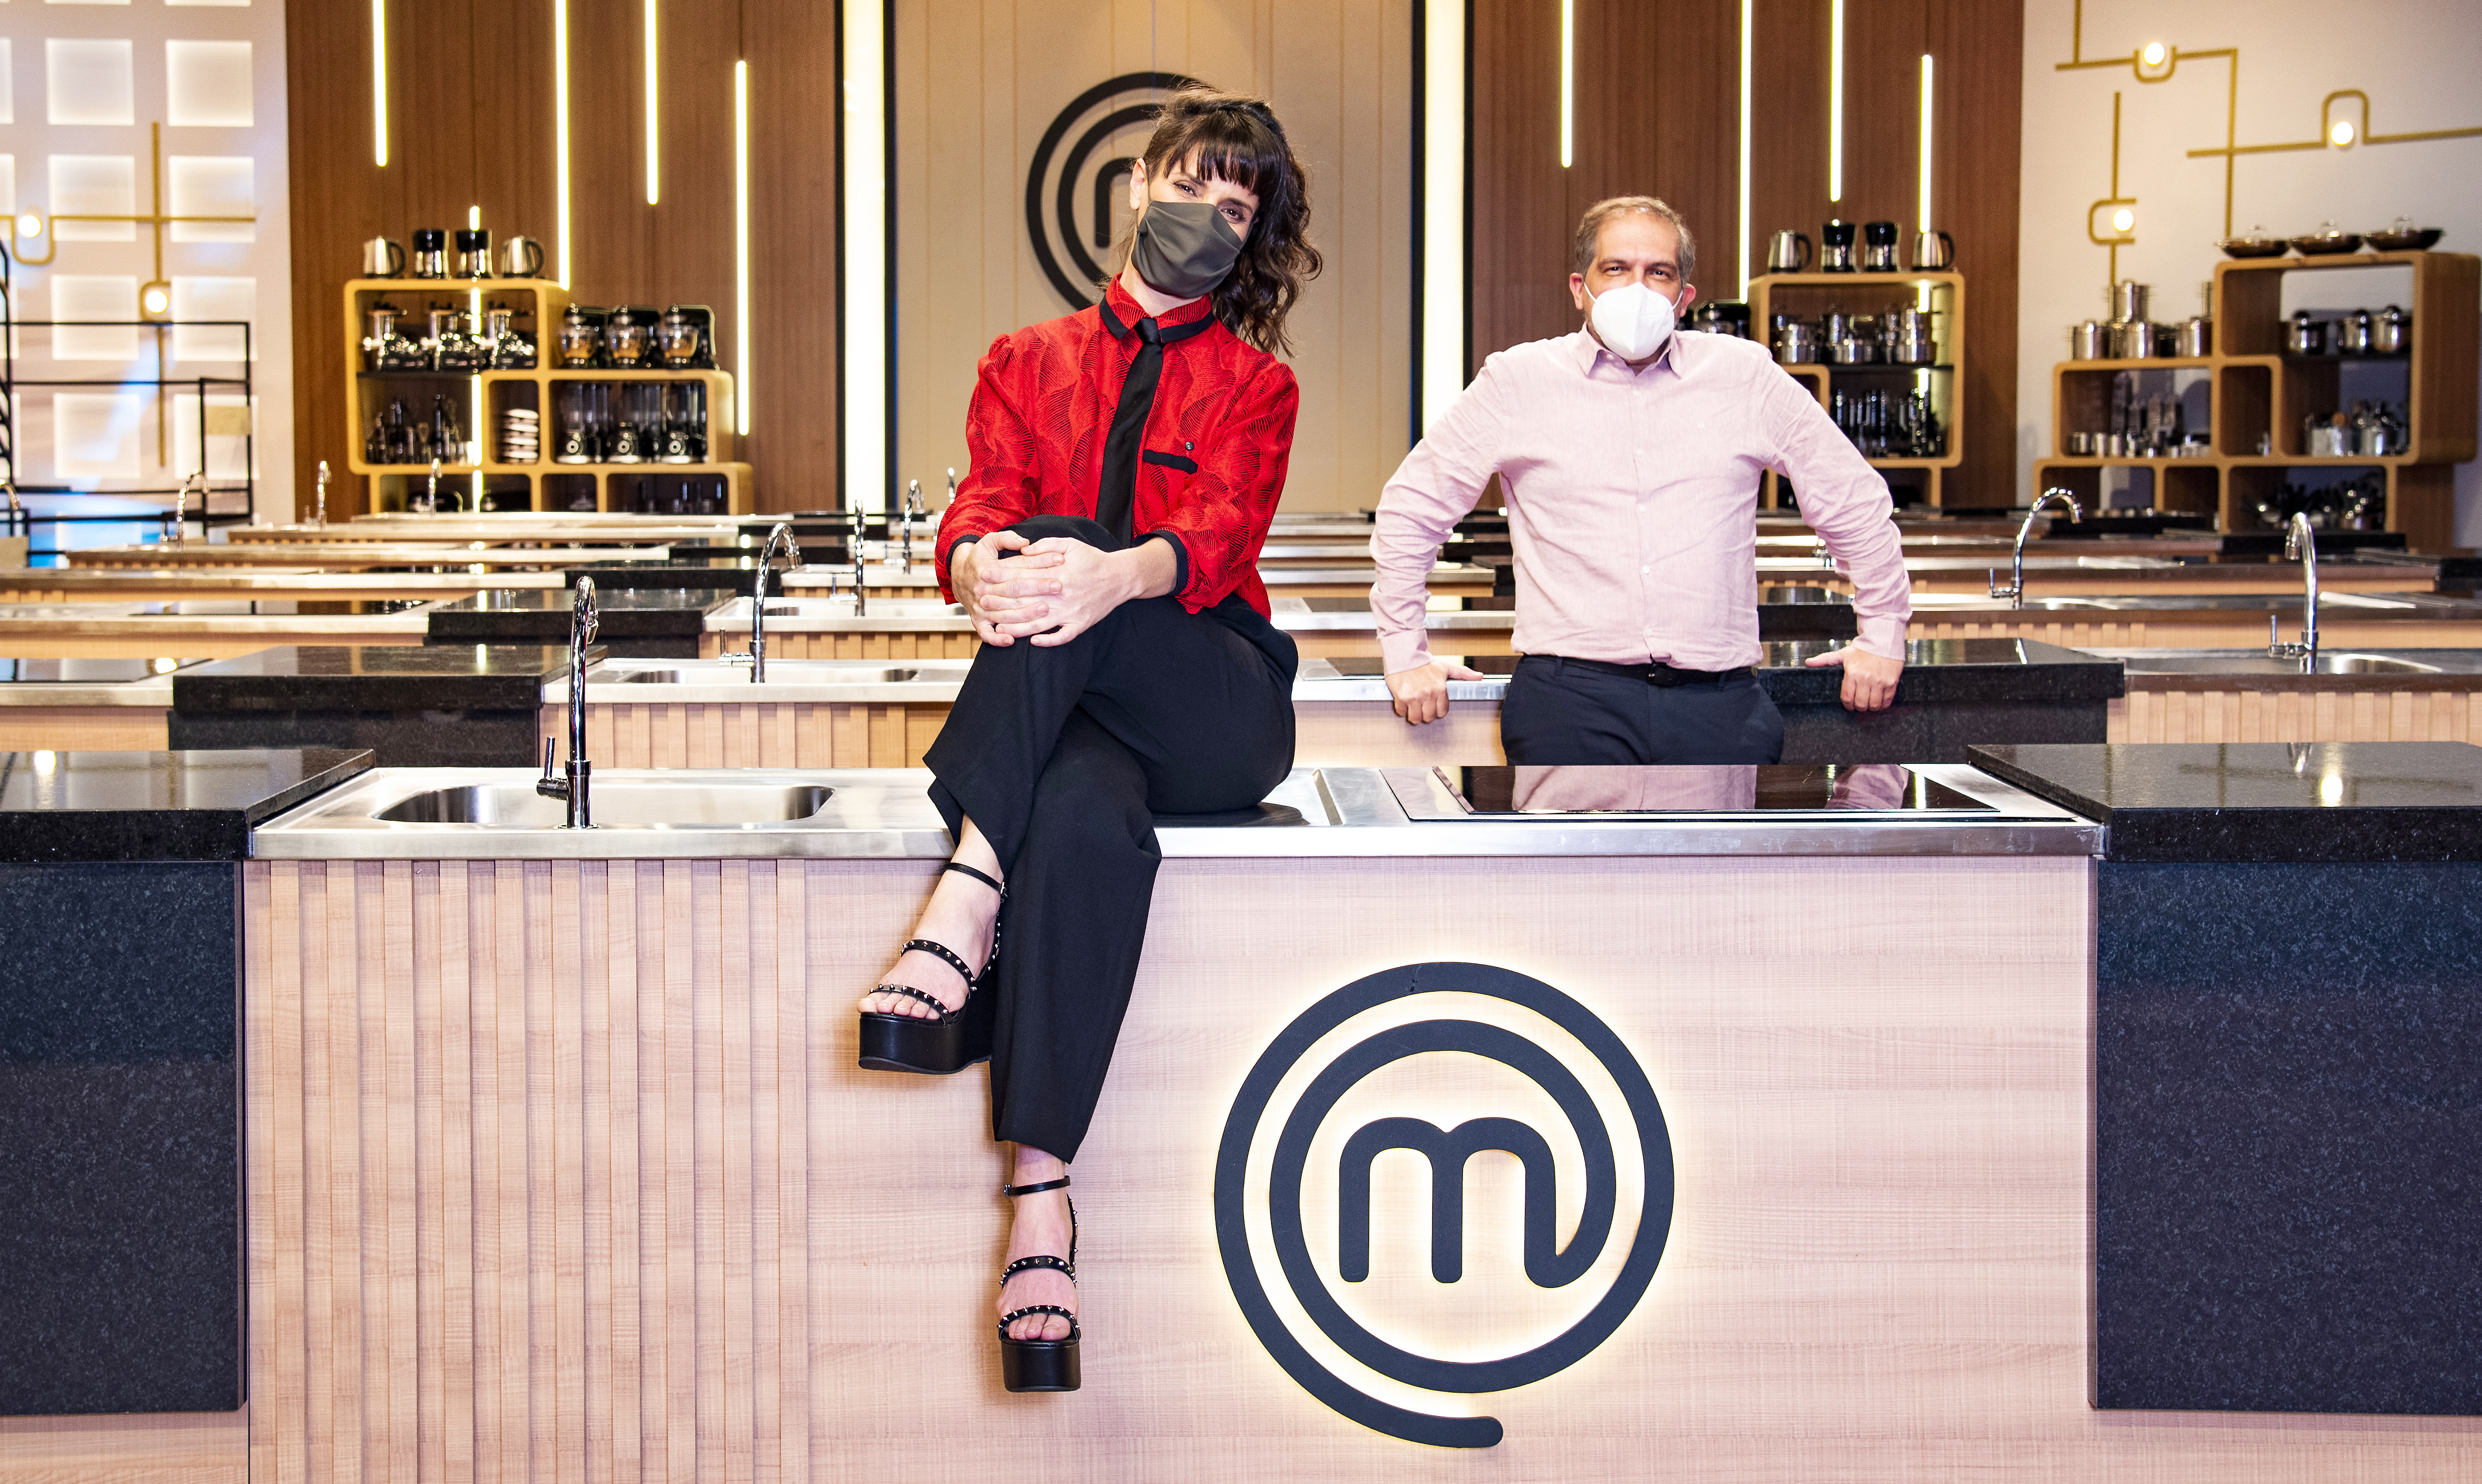 A chef Helena Rizzo sentada na bancada do MasterChef e Arnaldo Lorençato encostado na bancada logo atrás, à direita. Ambos de máscara.